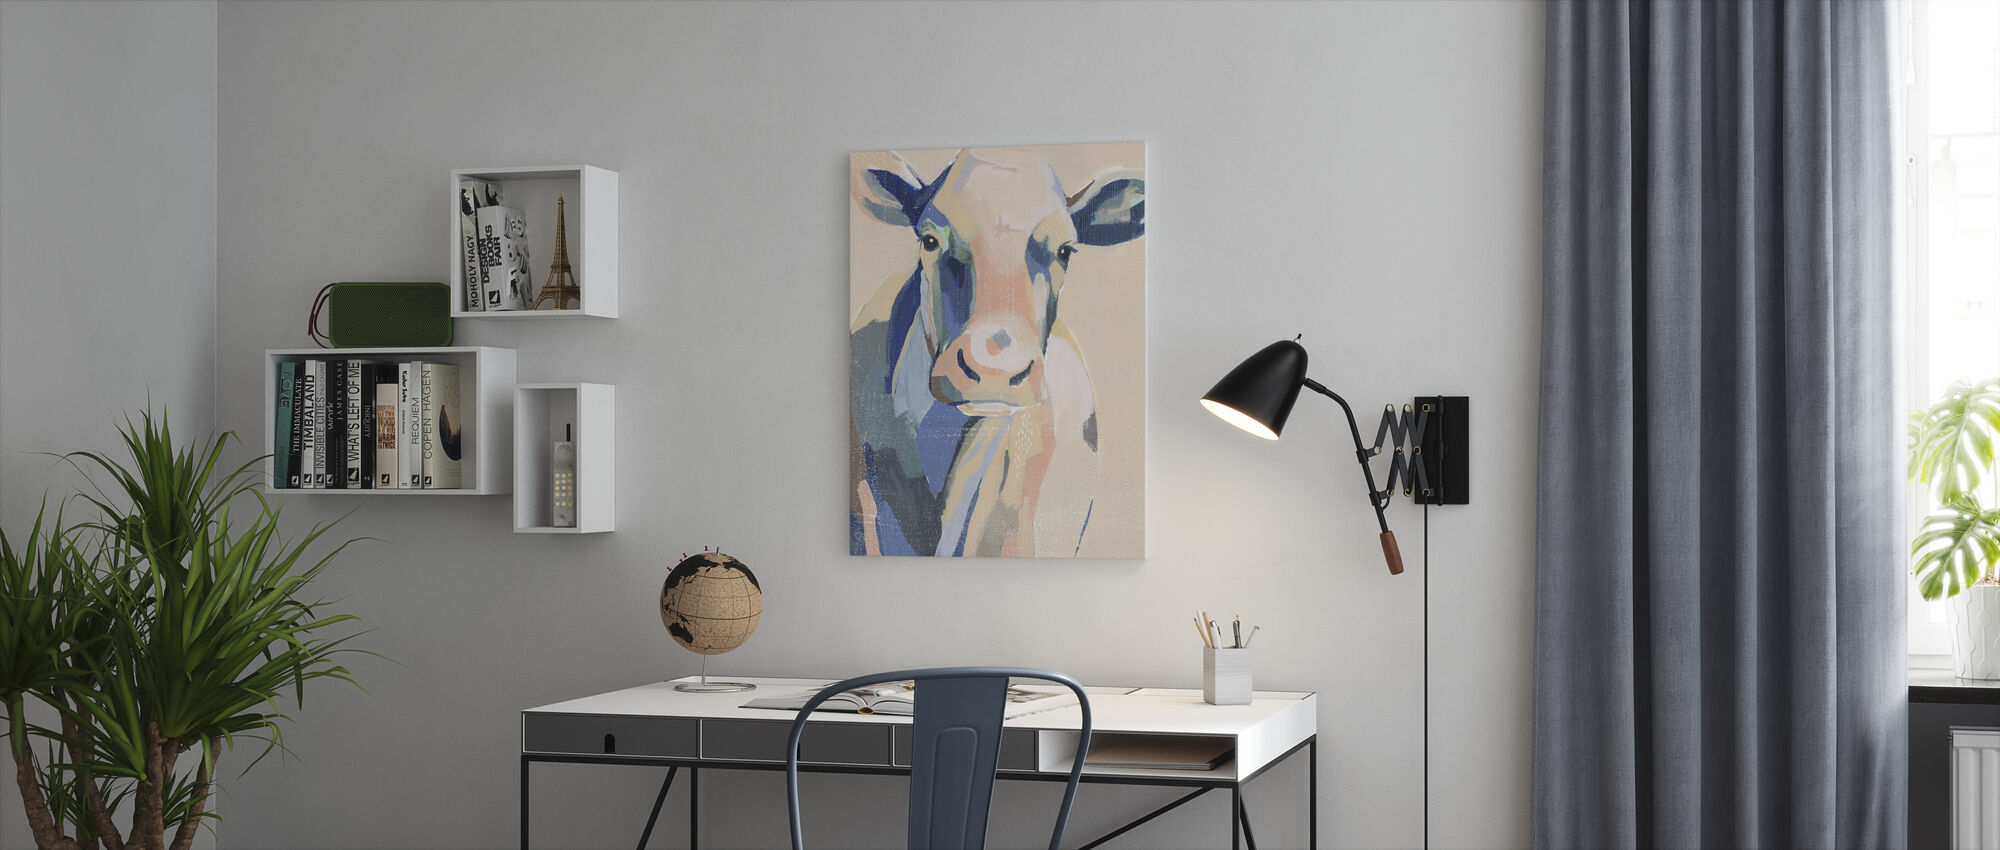 Hertford Holstein - Canvastavla - Kontor